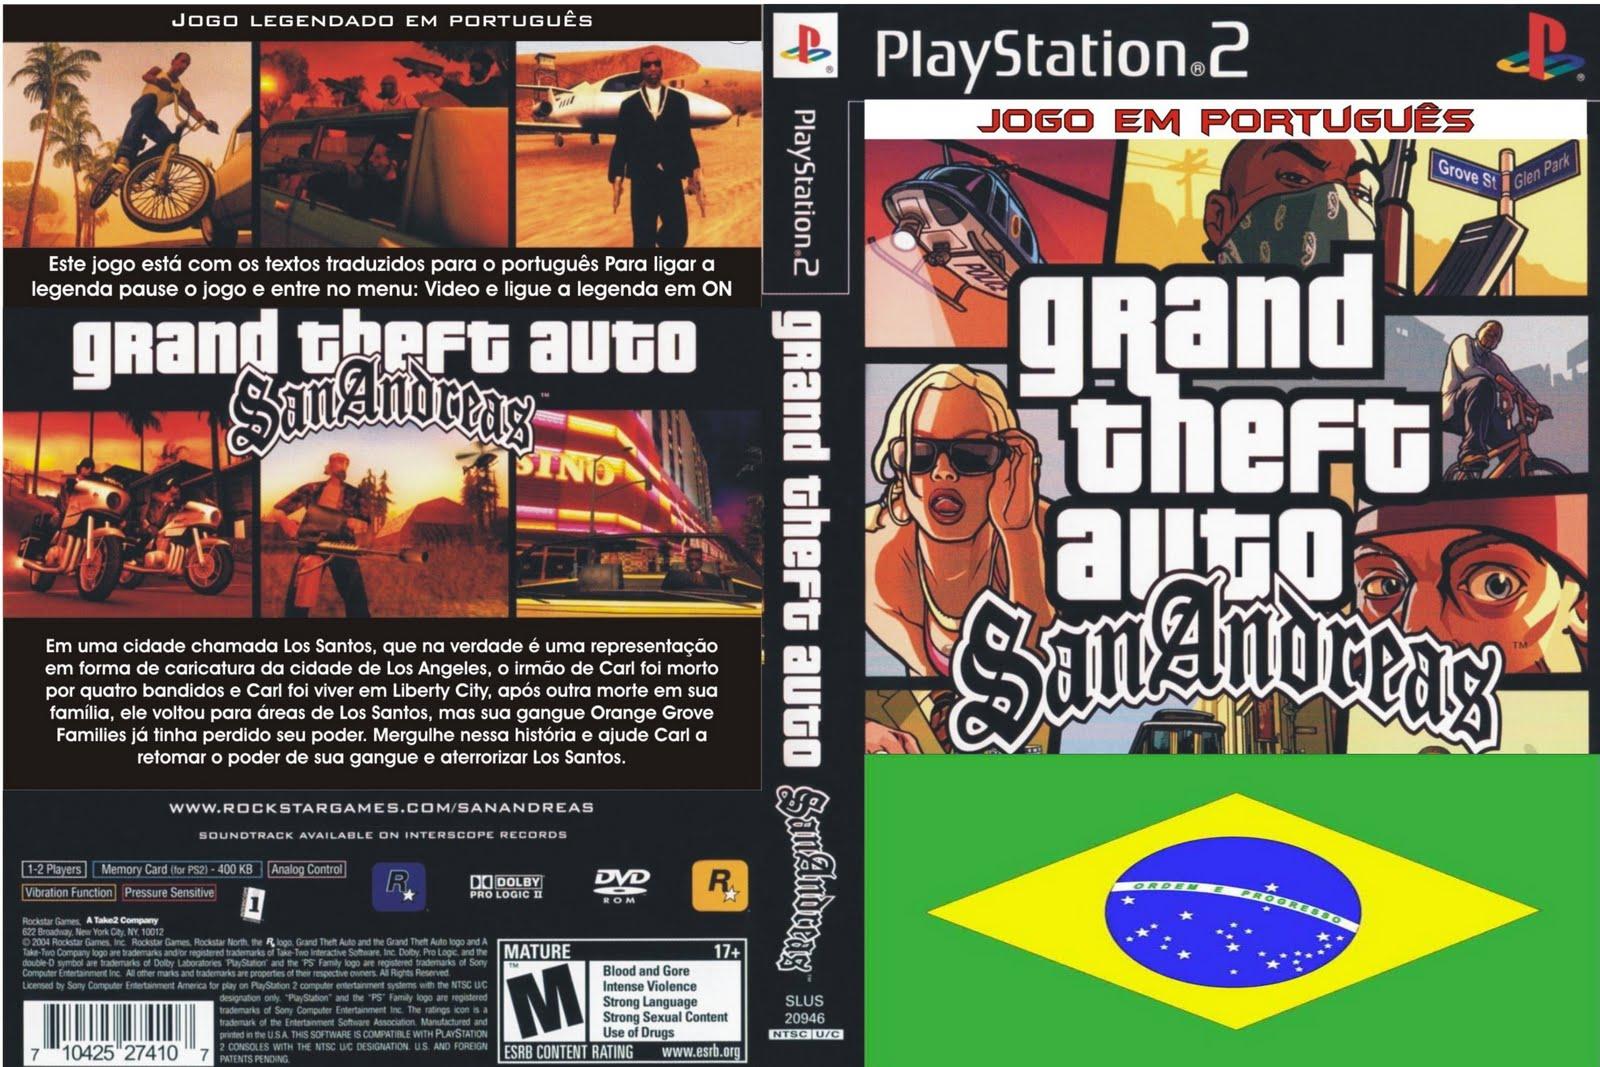 ELITE TROPA BAIXAR DE PS2 JOGO GTA